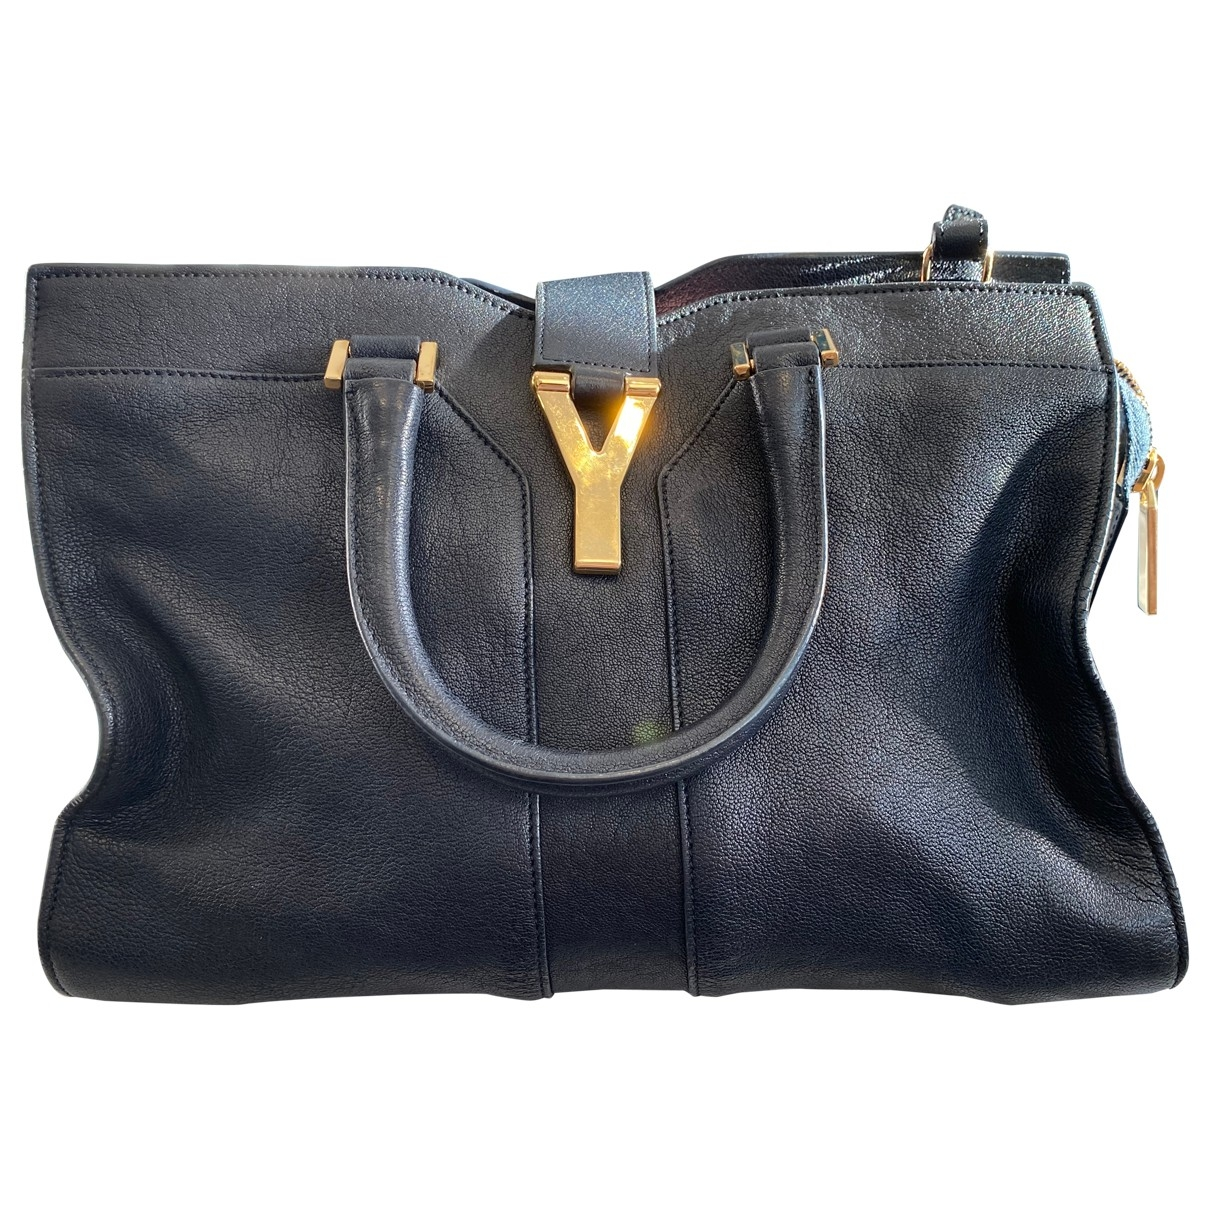 Yves Saint Laurent Chyc Navy Leather handbag for Women \N